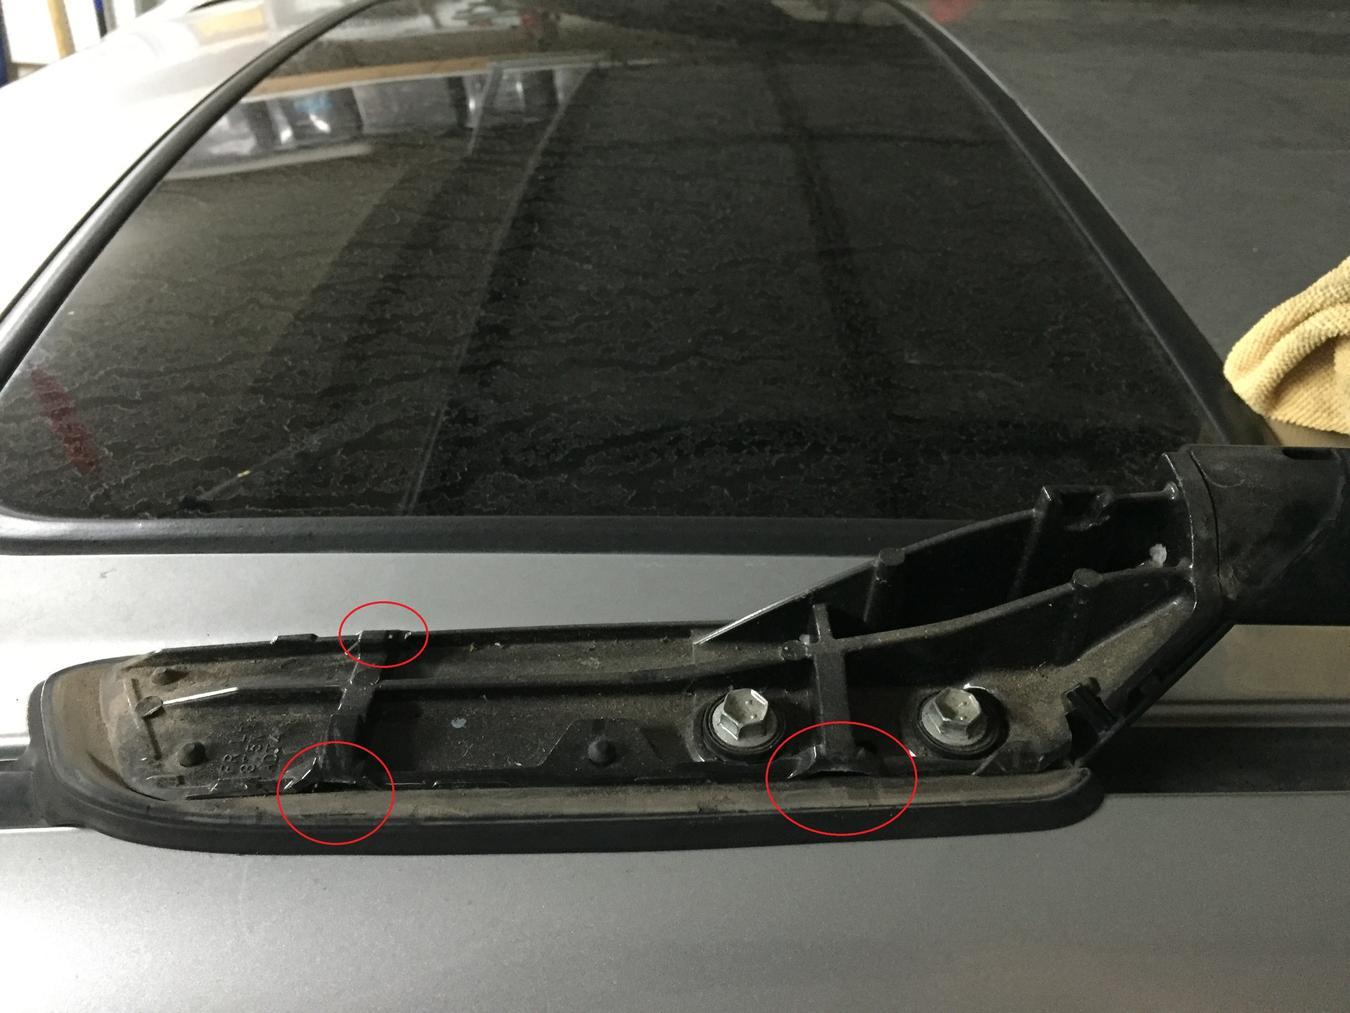 How do you remove the roof racks?-img_0142-jpg